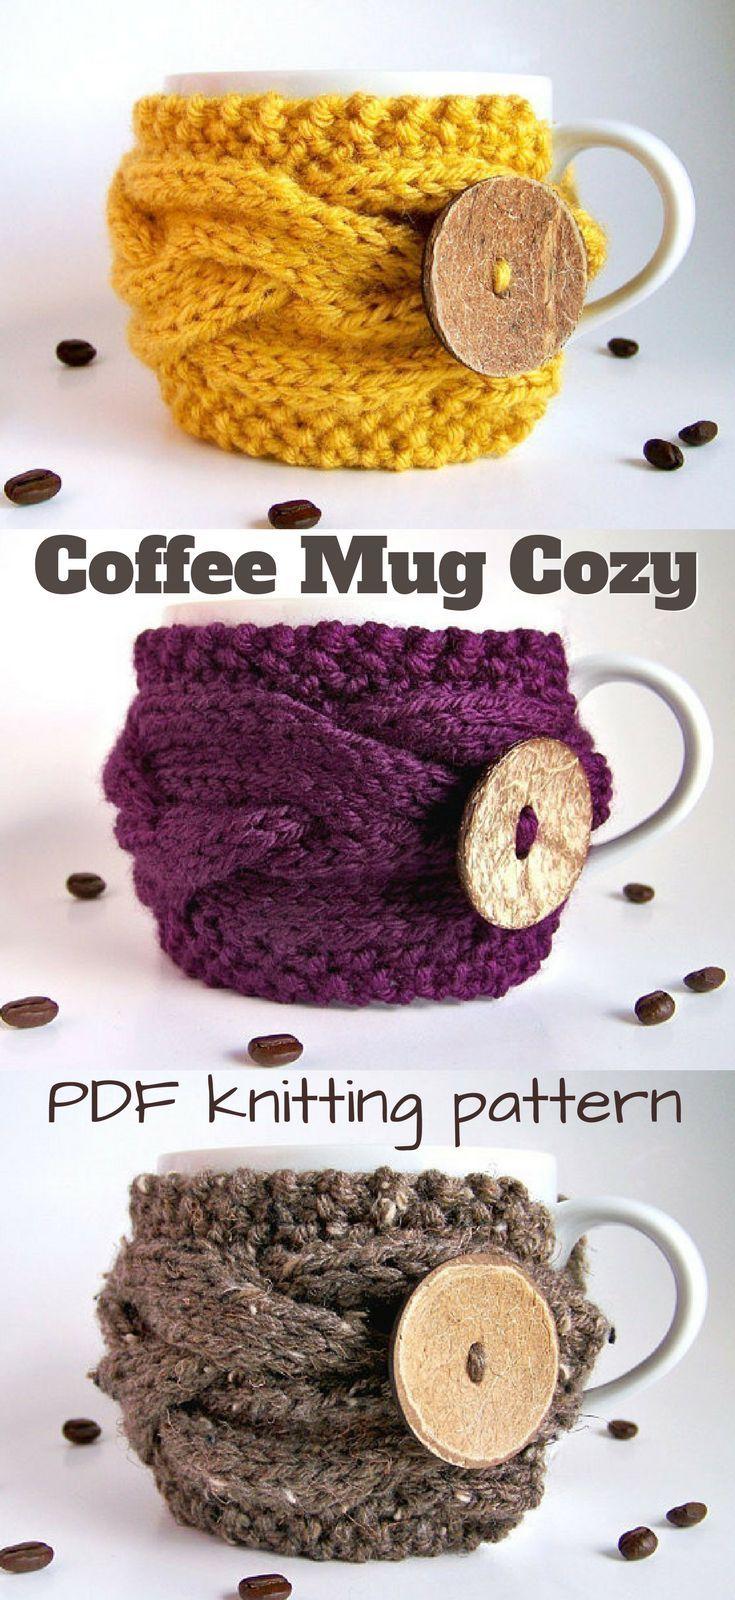 Knitting PATTERN, Tea Cozy Pattern, Coffee Cozy Pattern, Mug Cozy ...